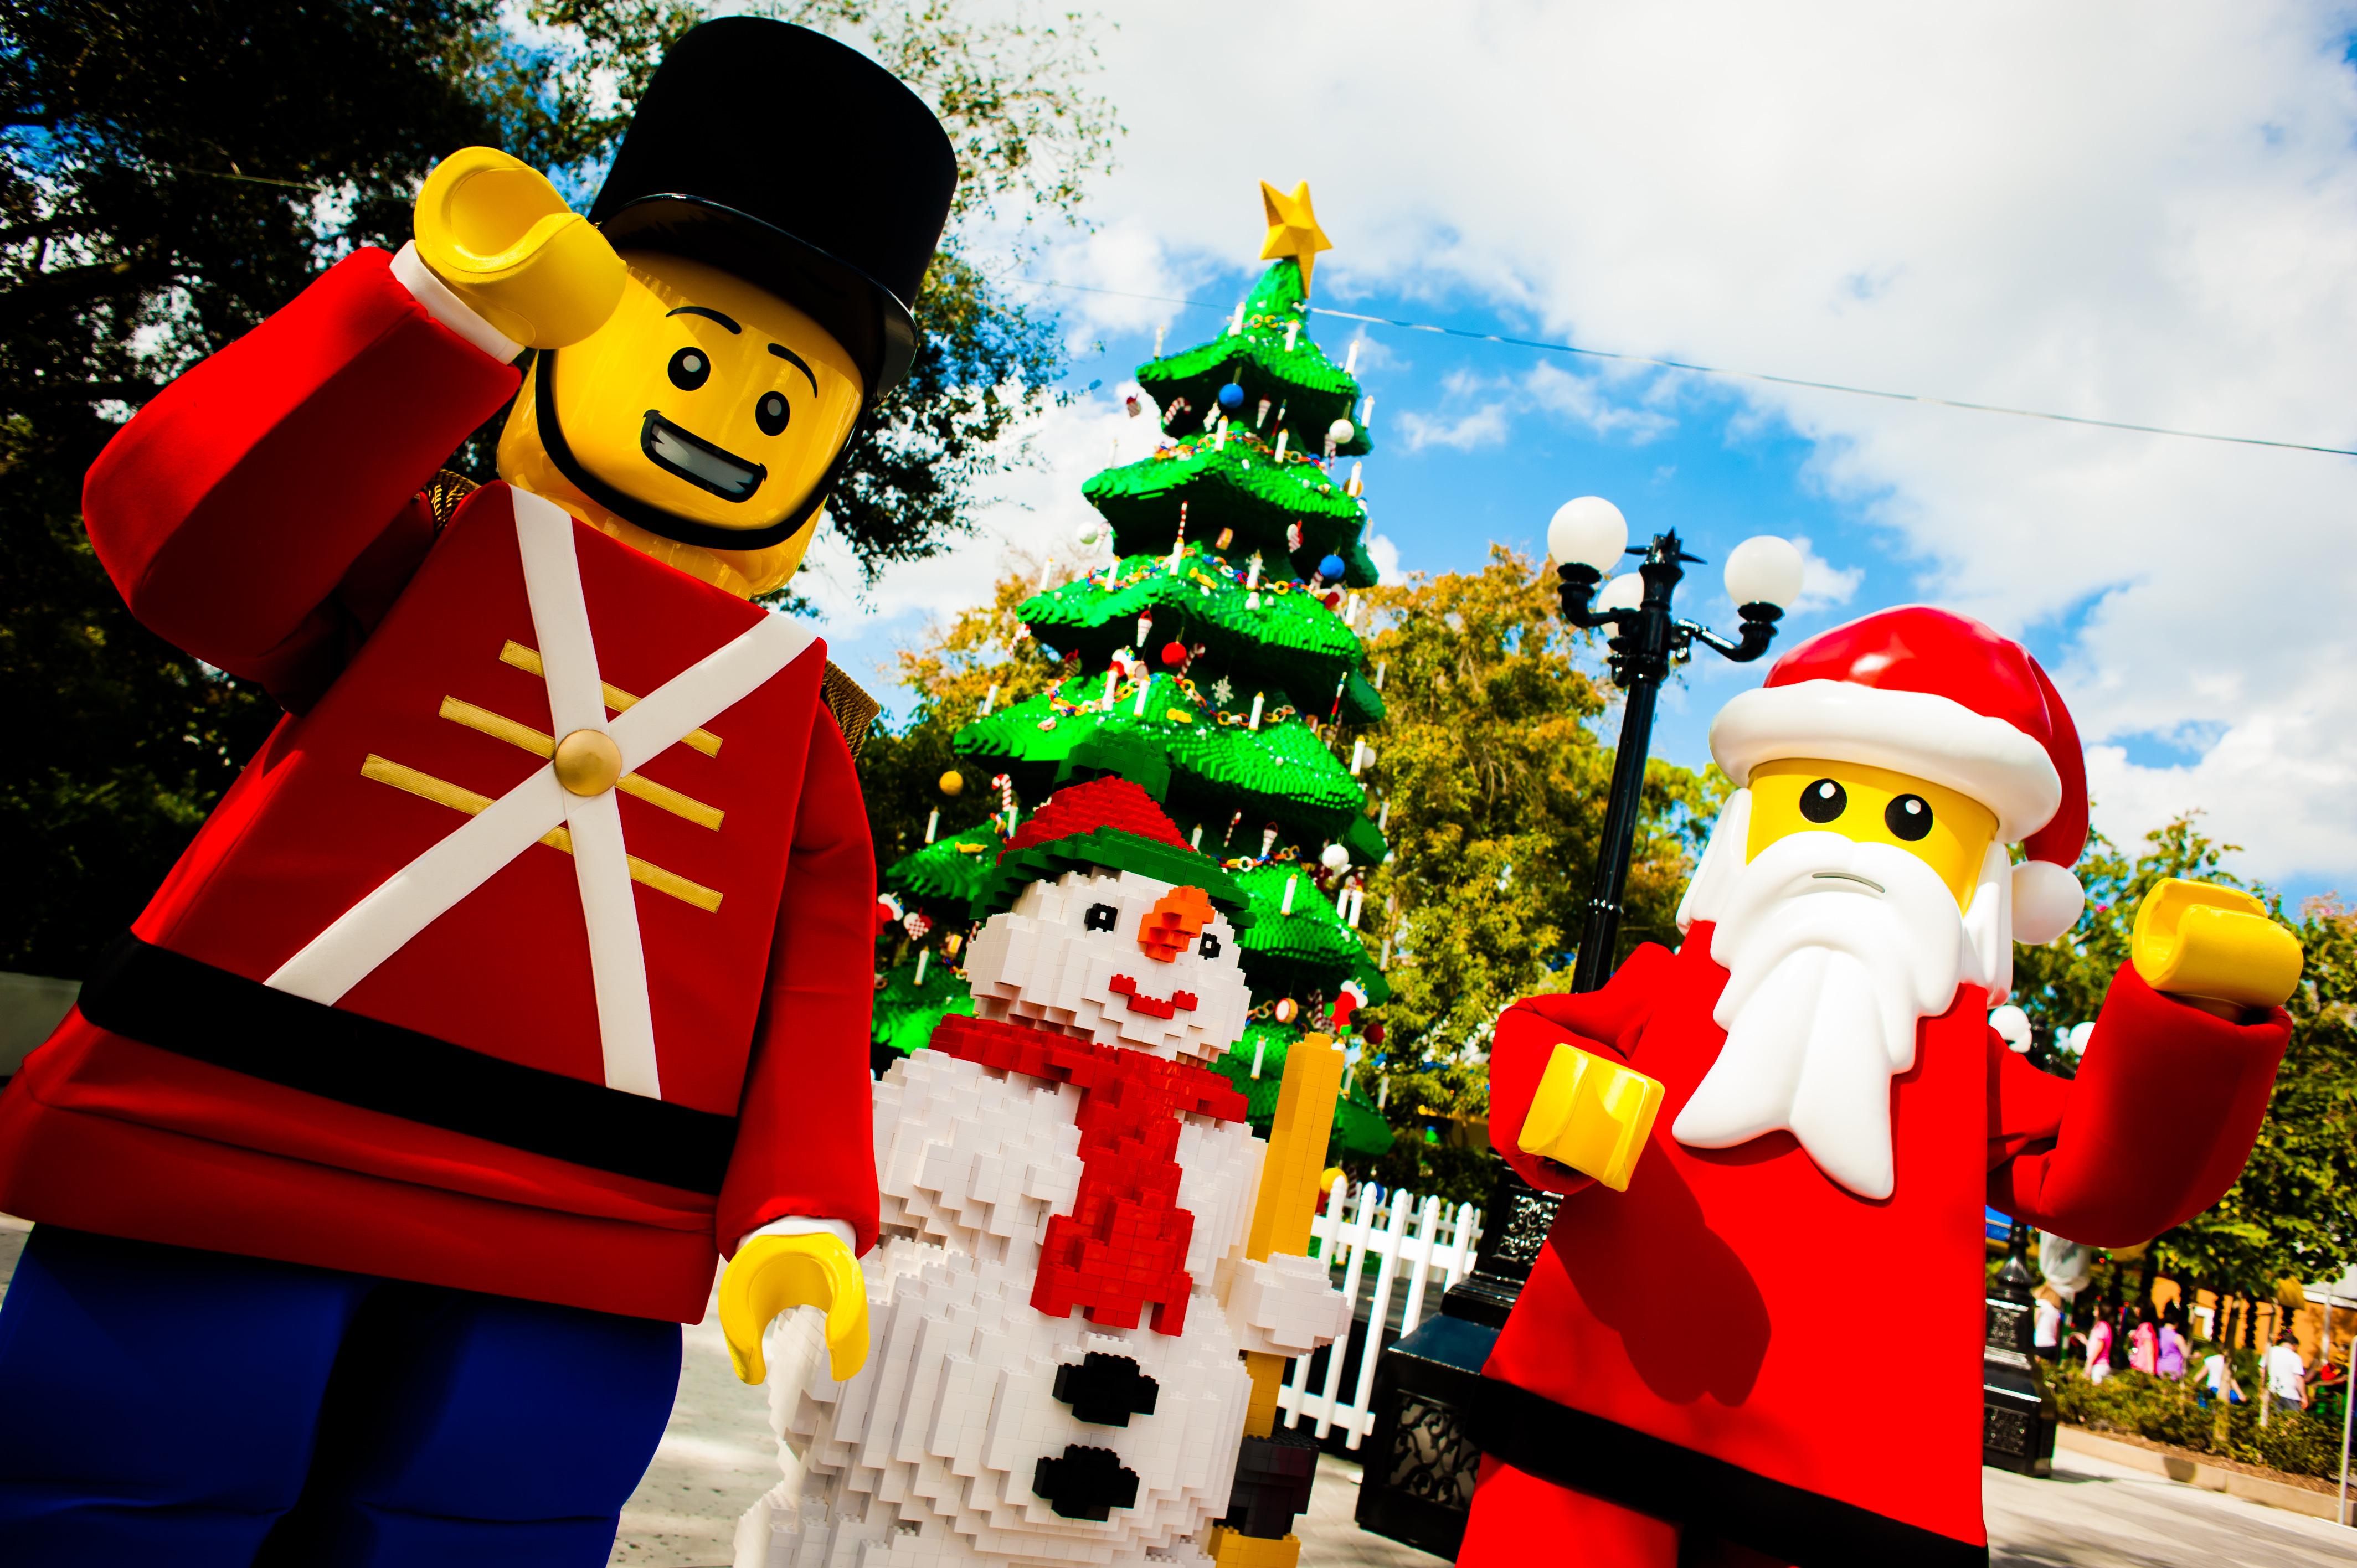 Christmas Bricktacular at Legoland Florida